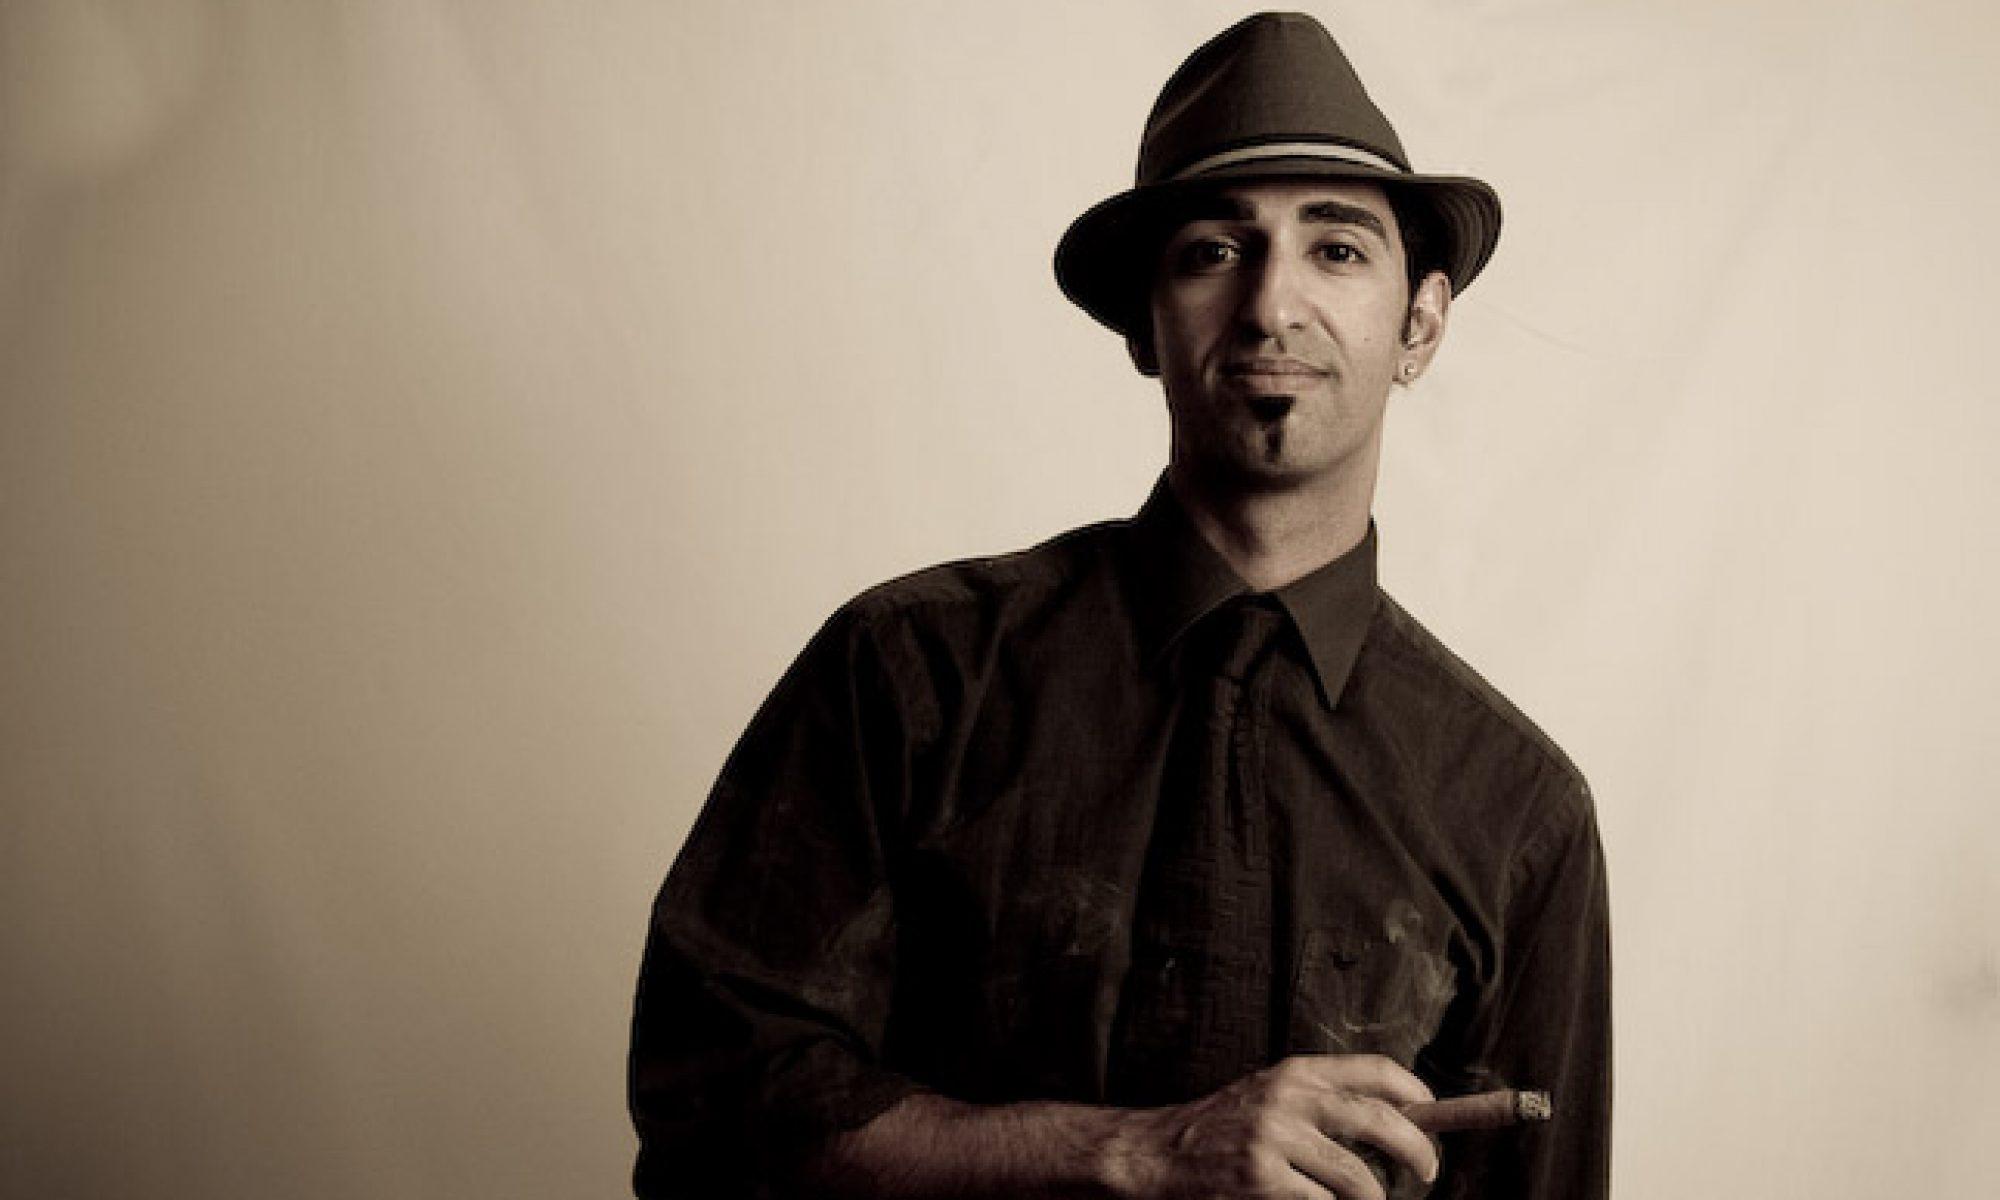 Navid Nourani-Vatani